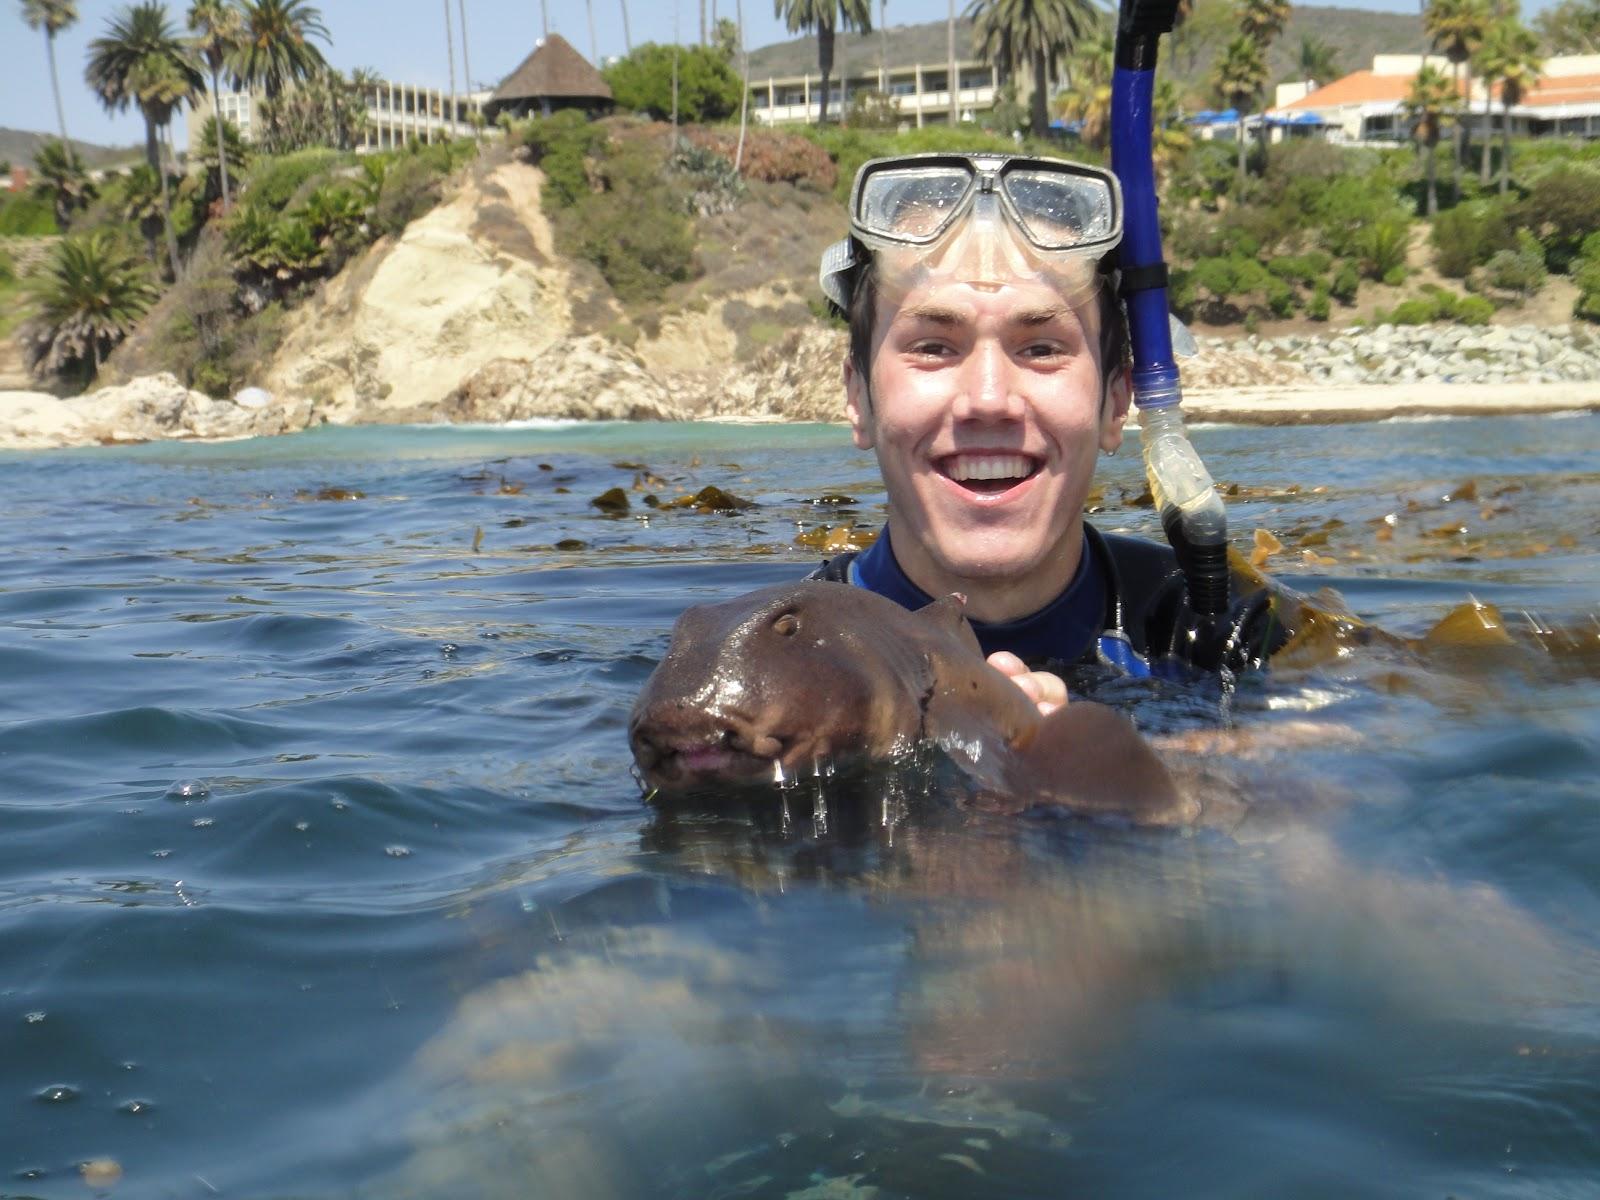 Happy Trails Snorkeling at Laguna Beach